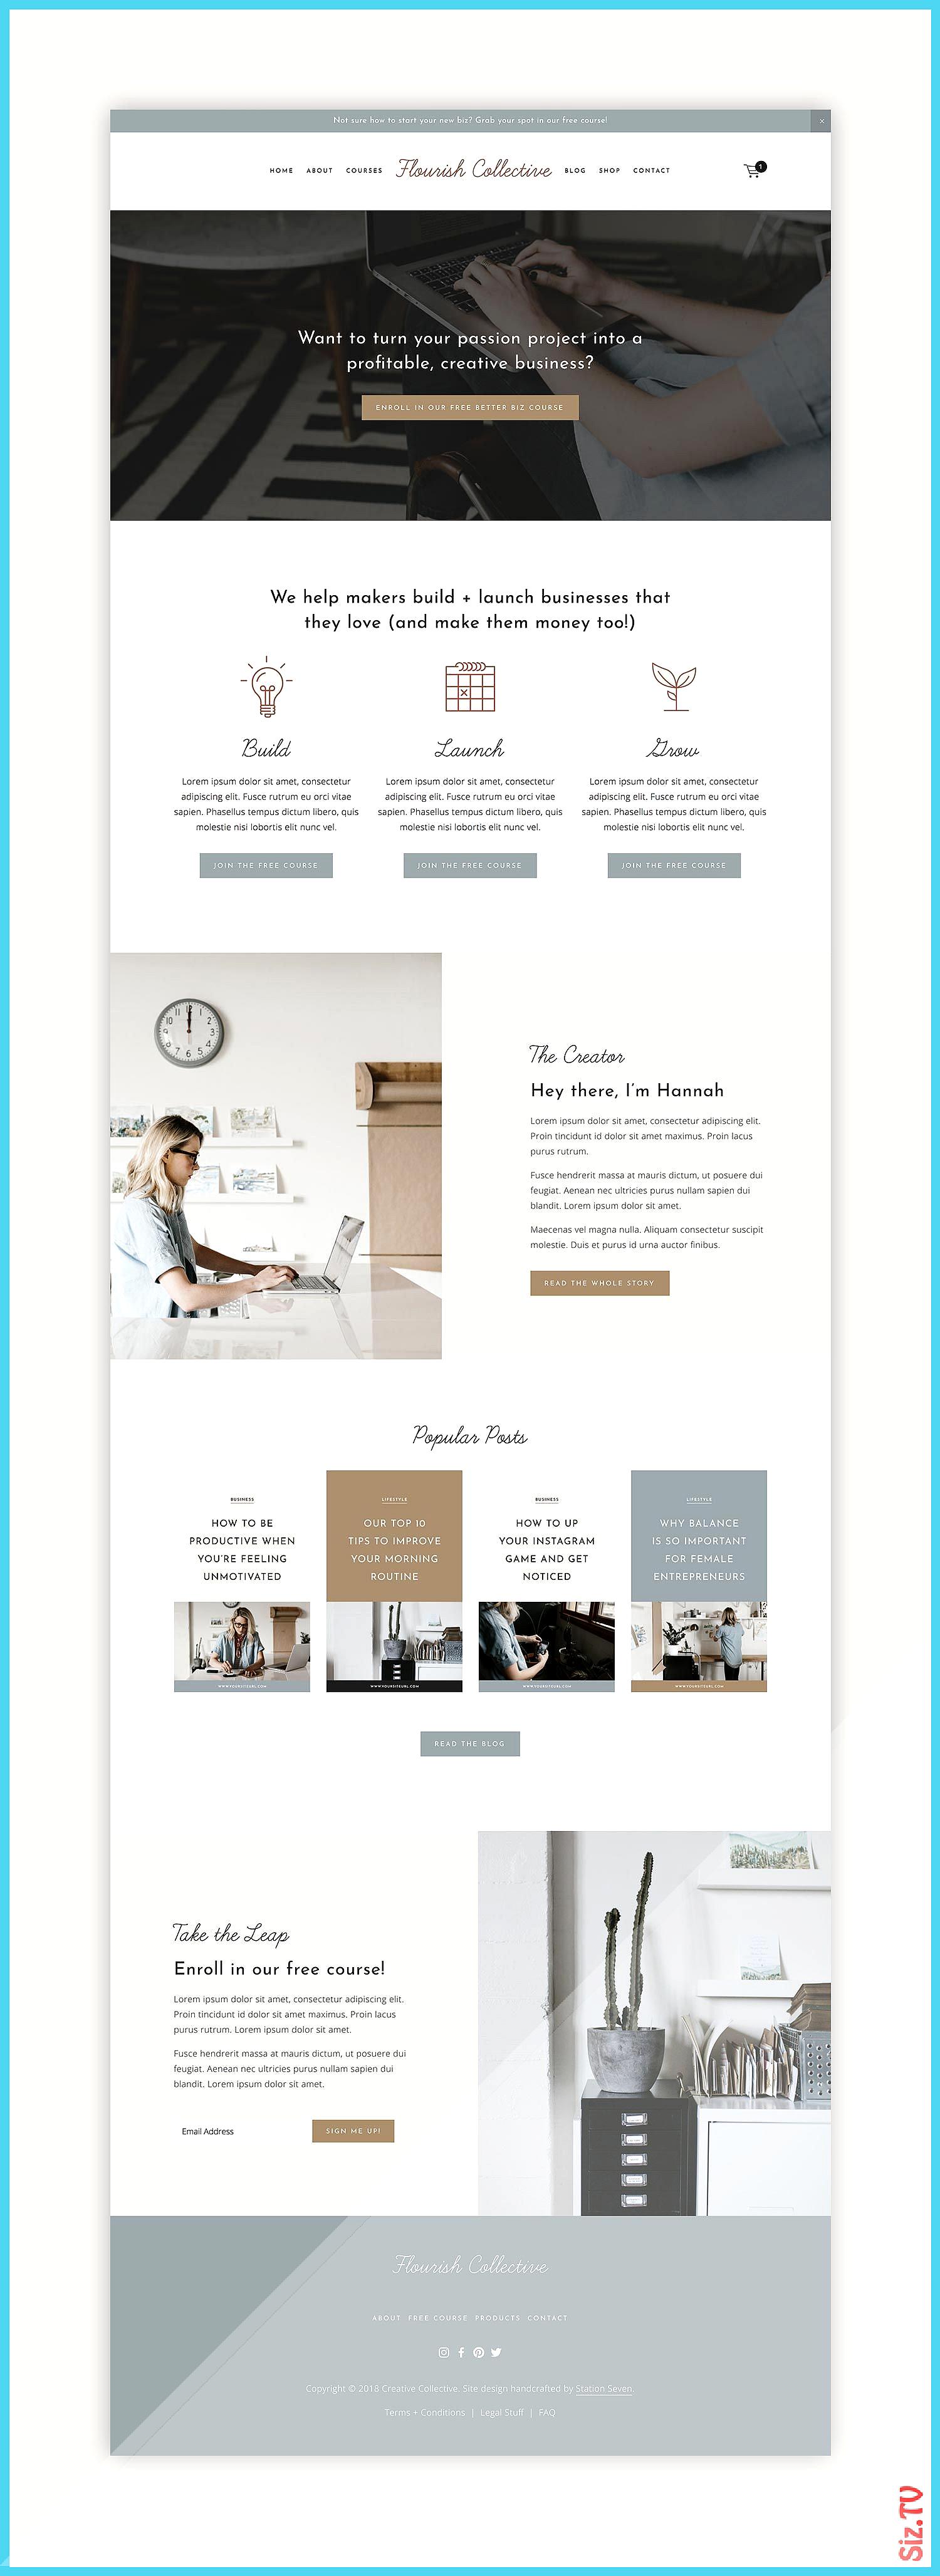 Flourish Squarespace Kit u2014 Station Seven Squarespace Templates WordPress Themes and Free Resourc...